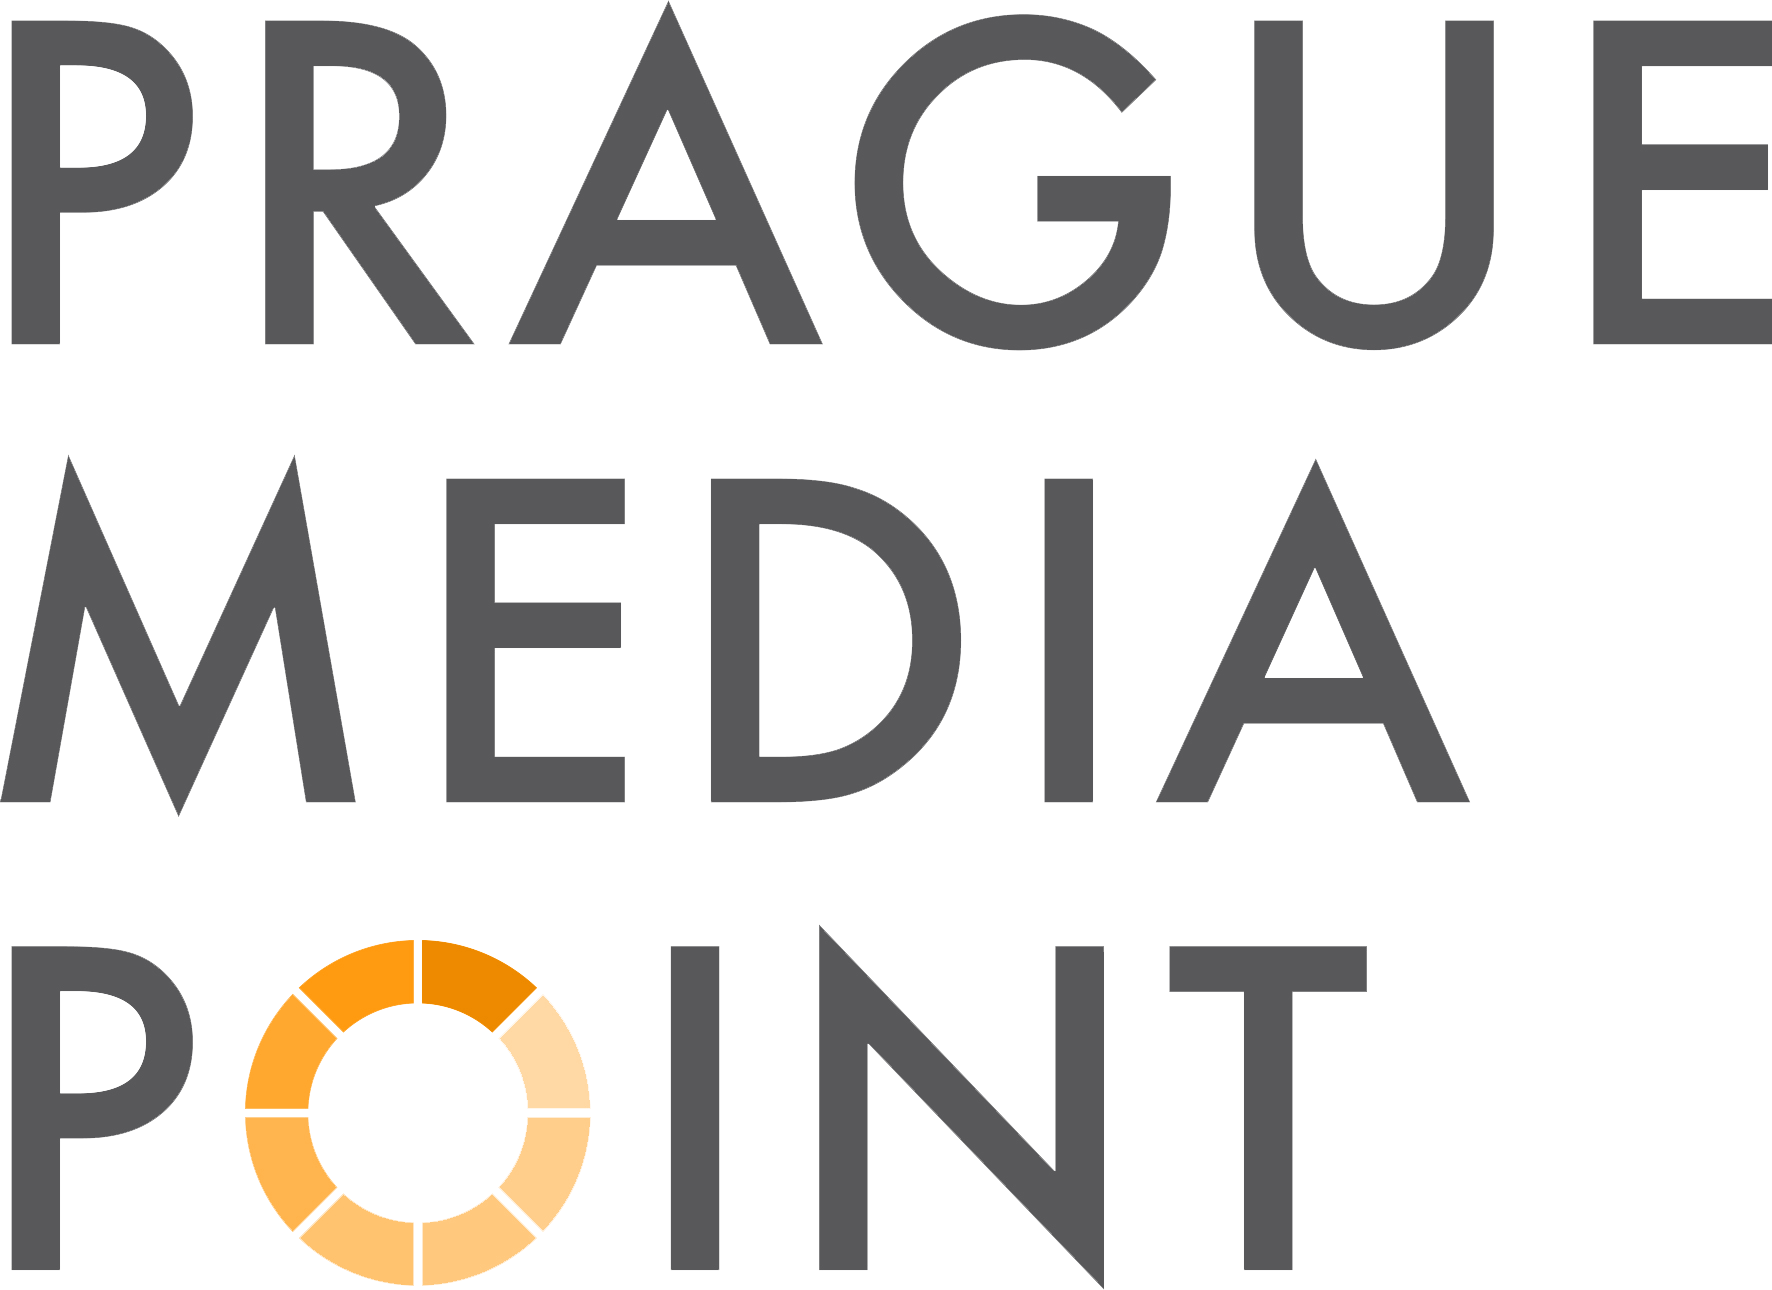 Prague Media Point Conference logo